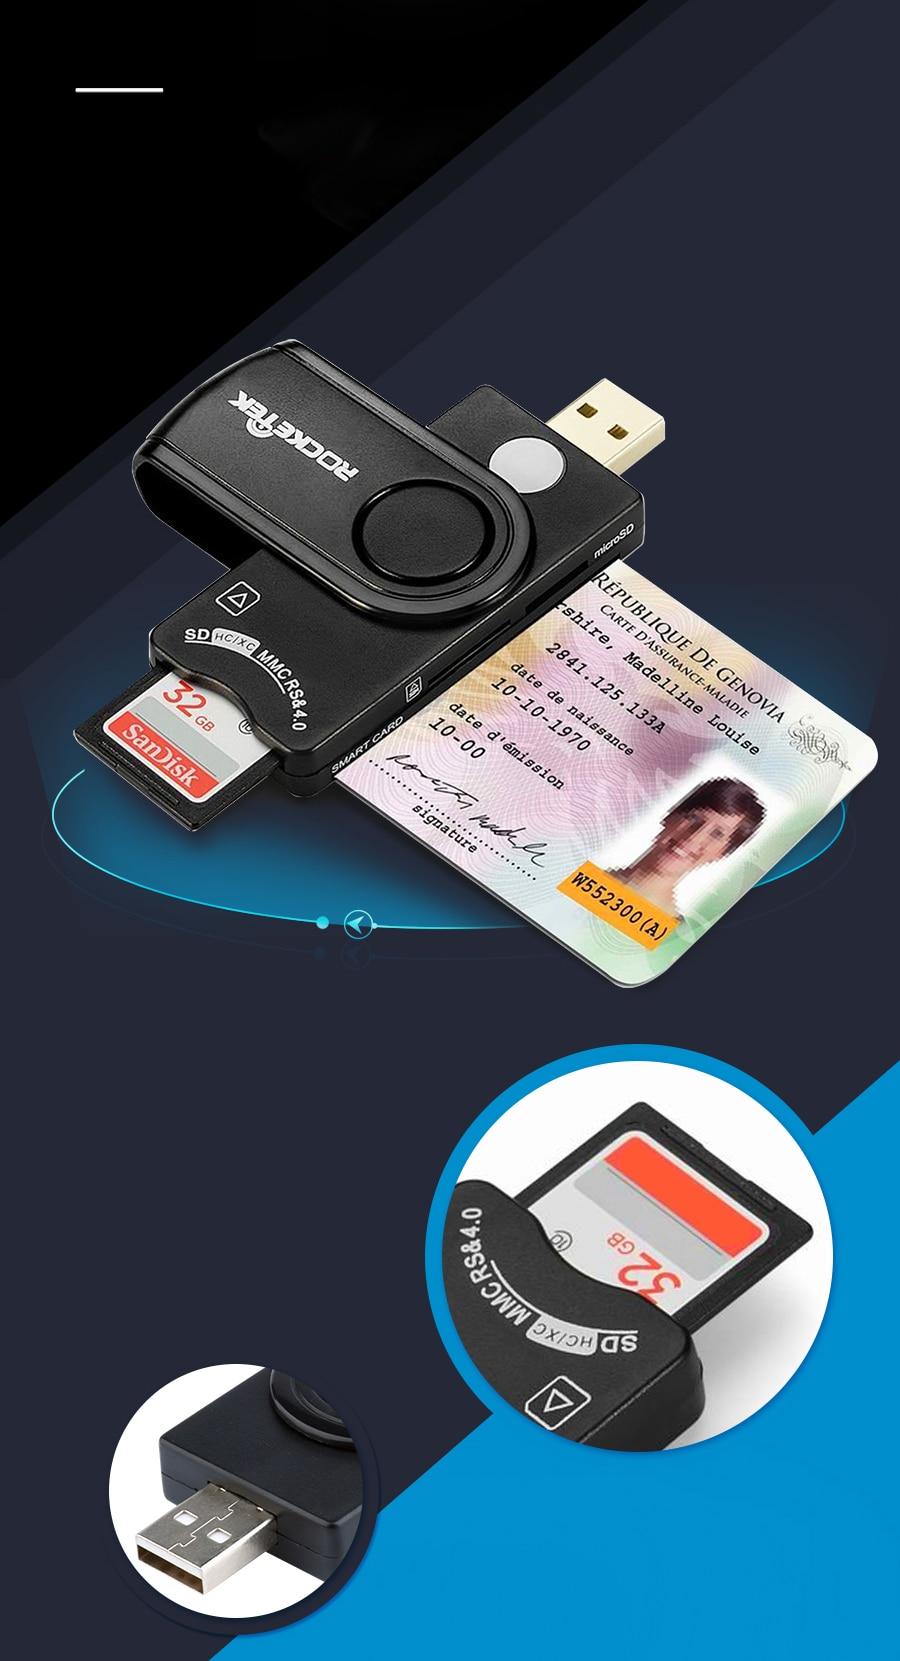 Rocketek USB 2.0 multi Smart Card Reader SD//TF MS M2 micro SD memory ID,Bank